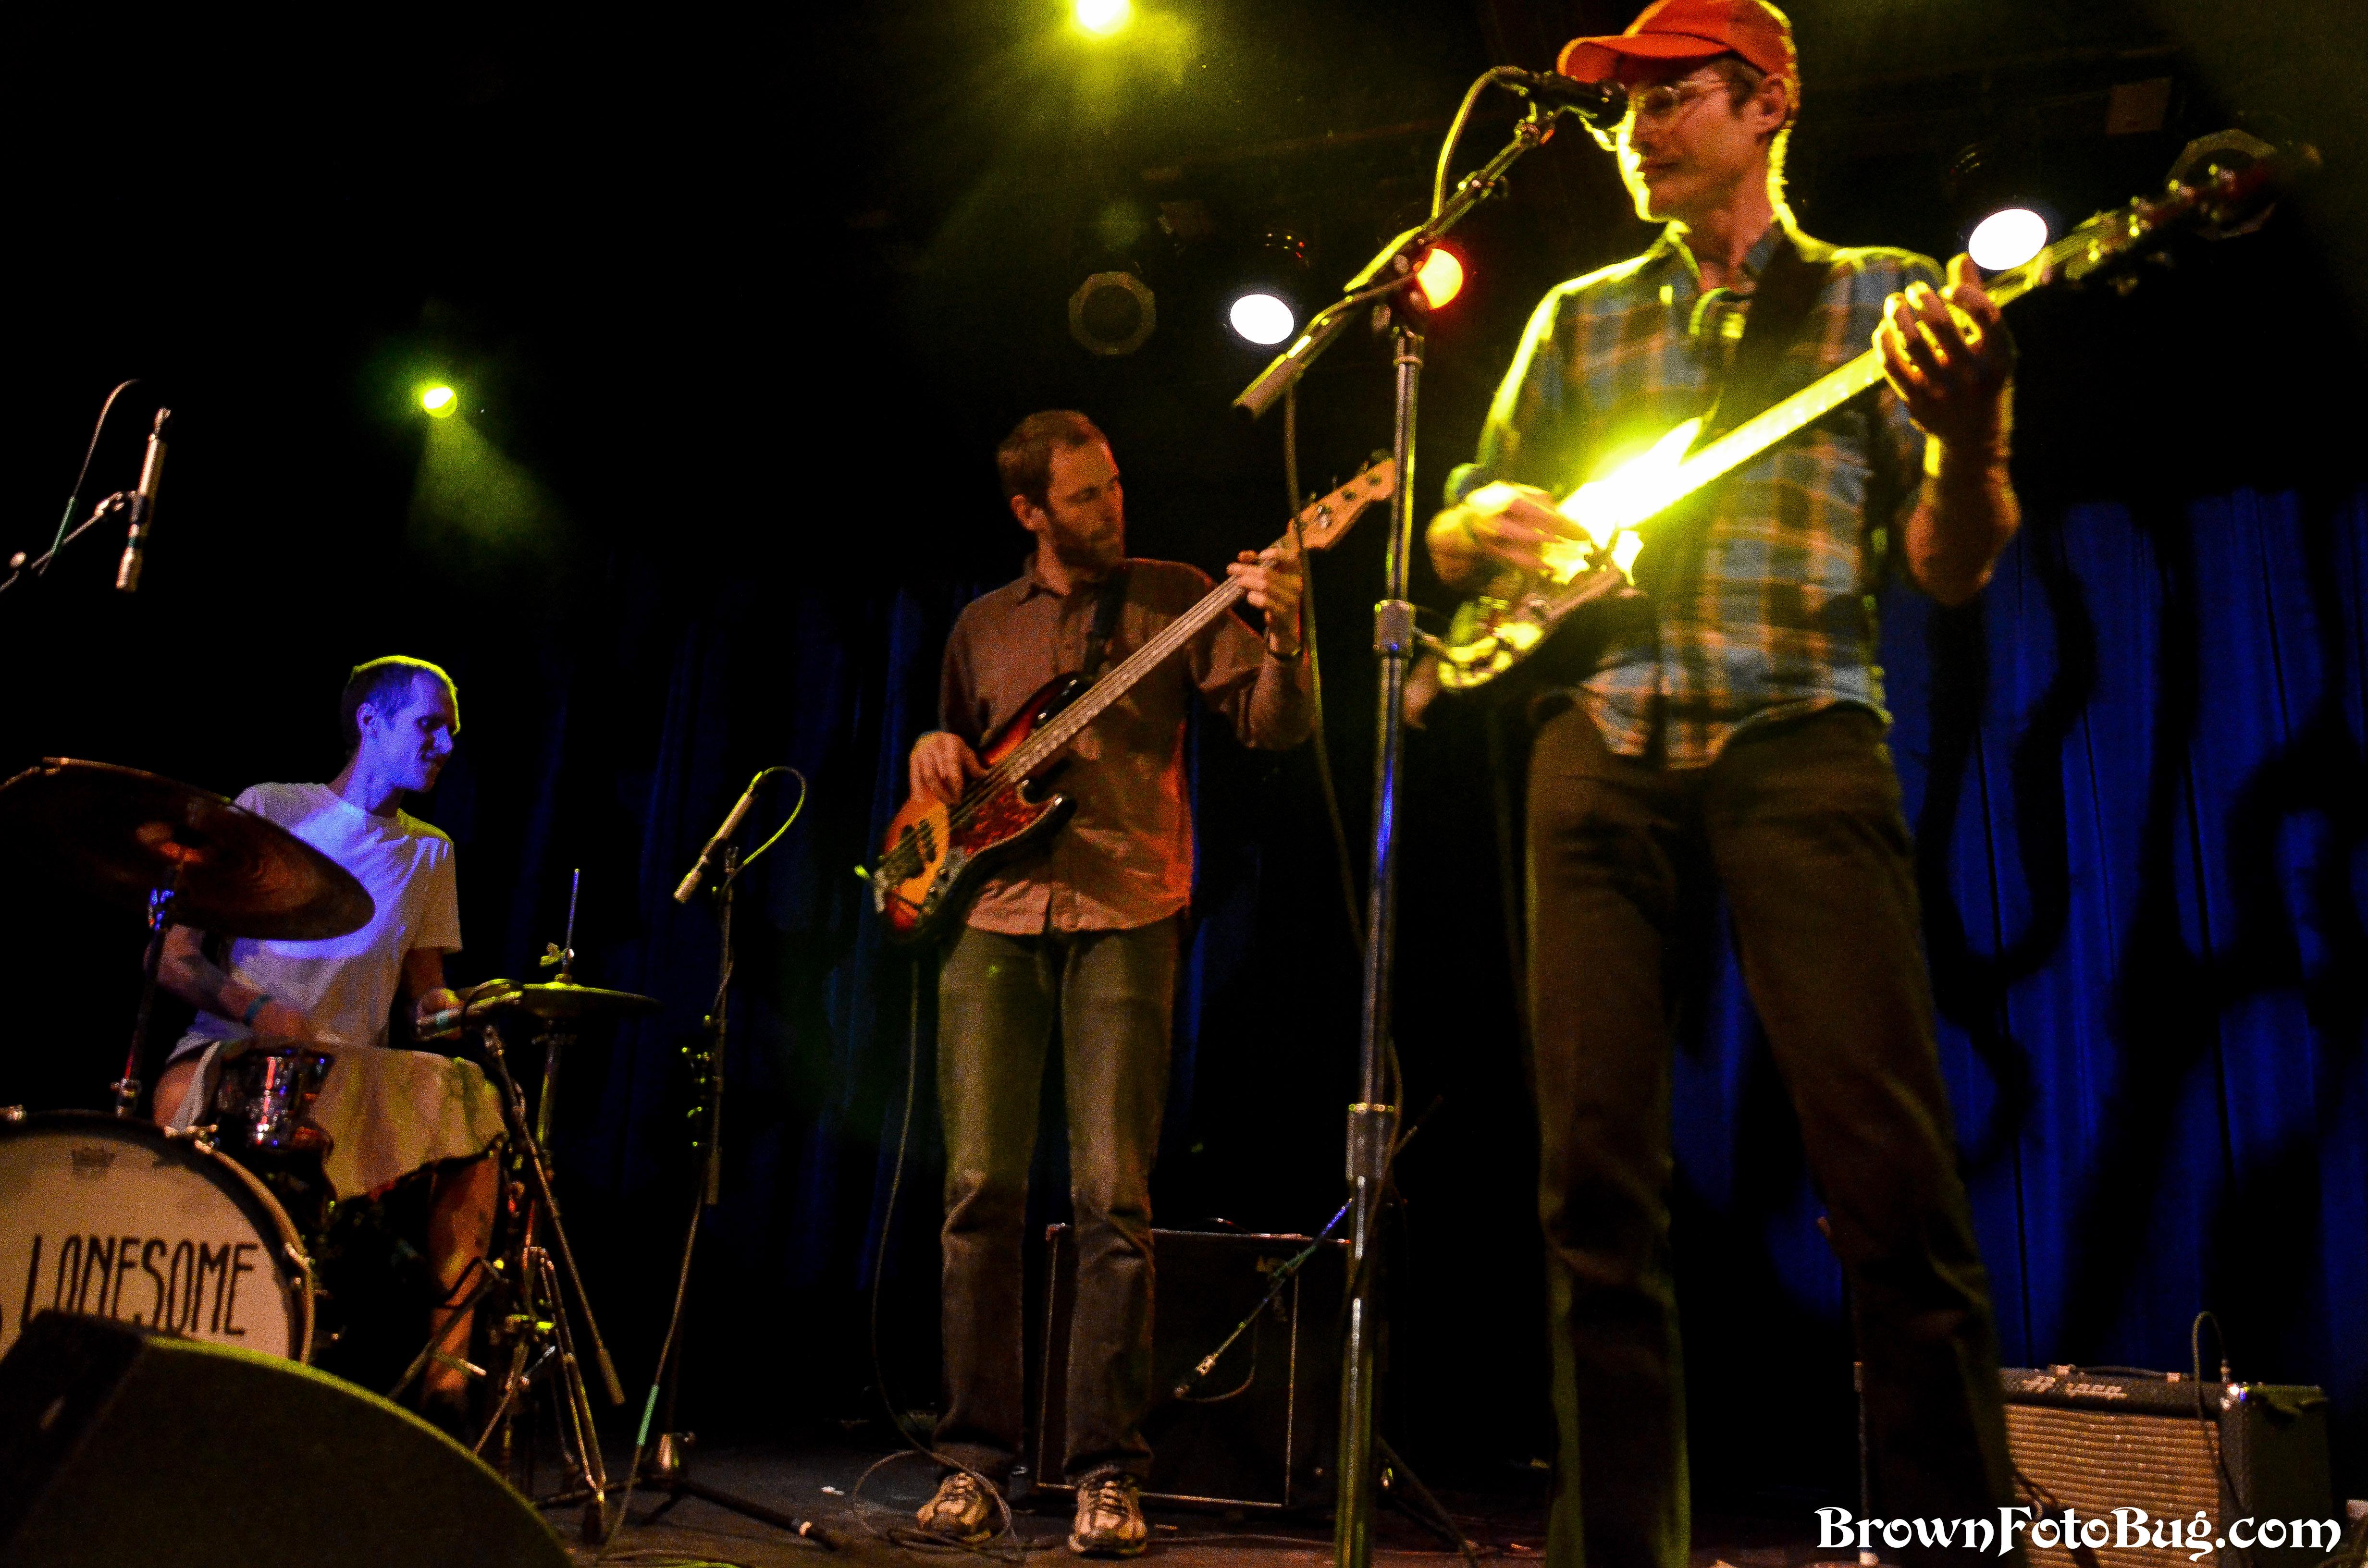 Bob Long III, Lonesome Shack and and Lonebird Live @ The Crocodile (Photo by Arlene Brown)